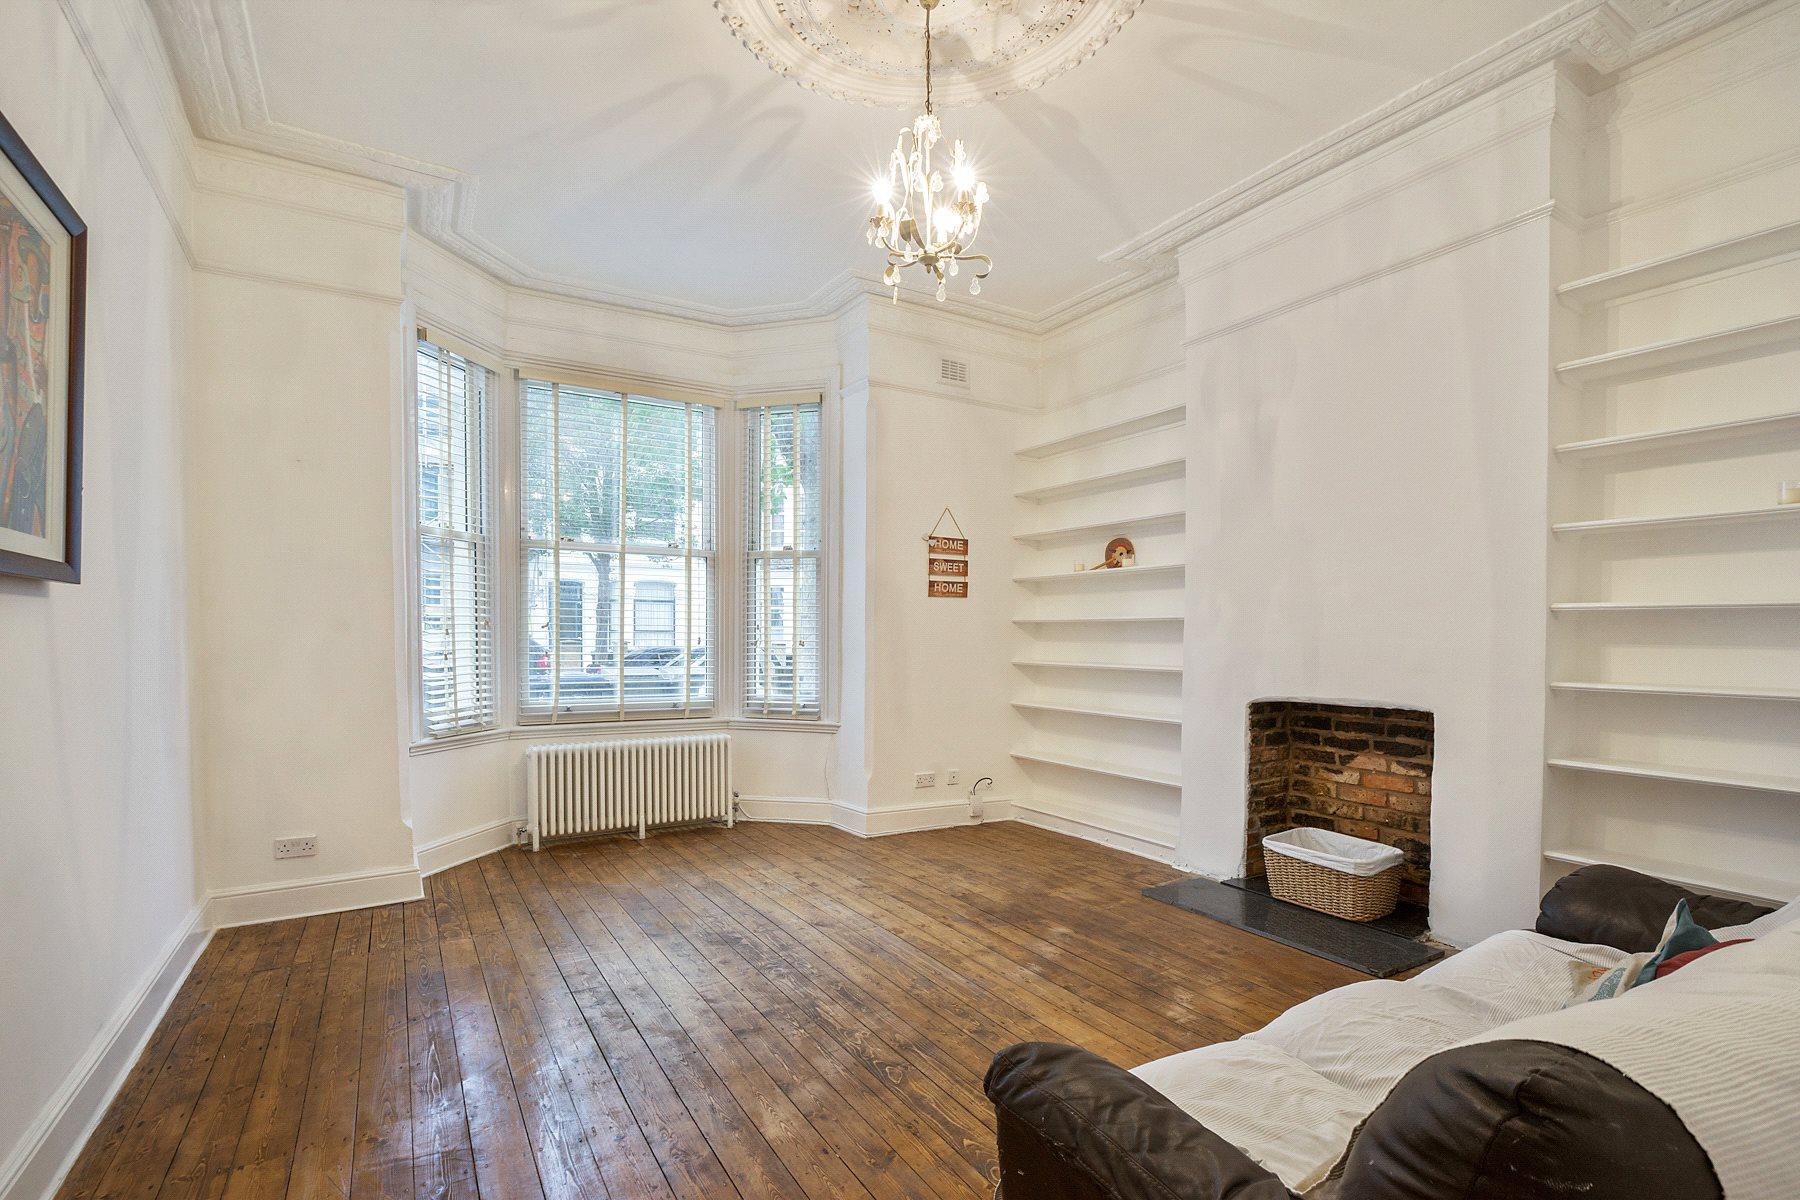 2 Bedrooms Flat for sale in Burton Road, Brondesbury, London, NW6